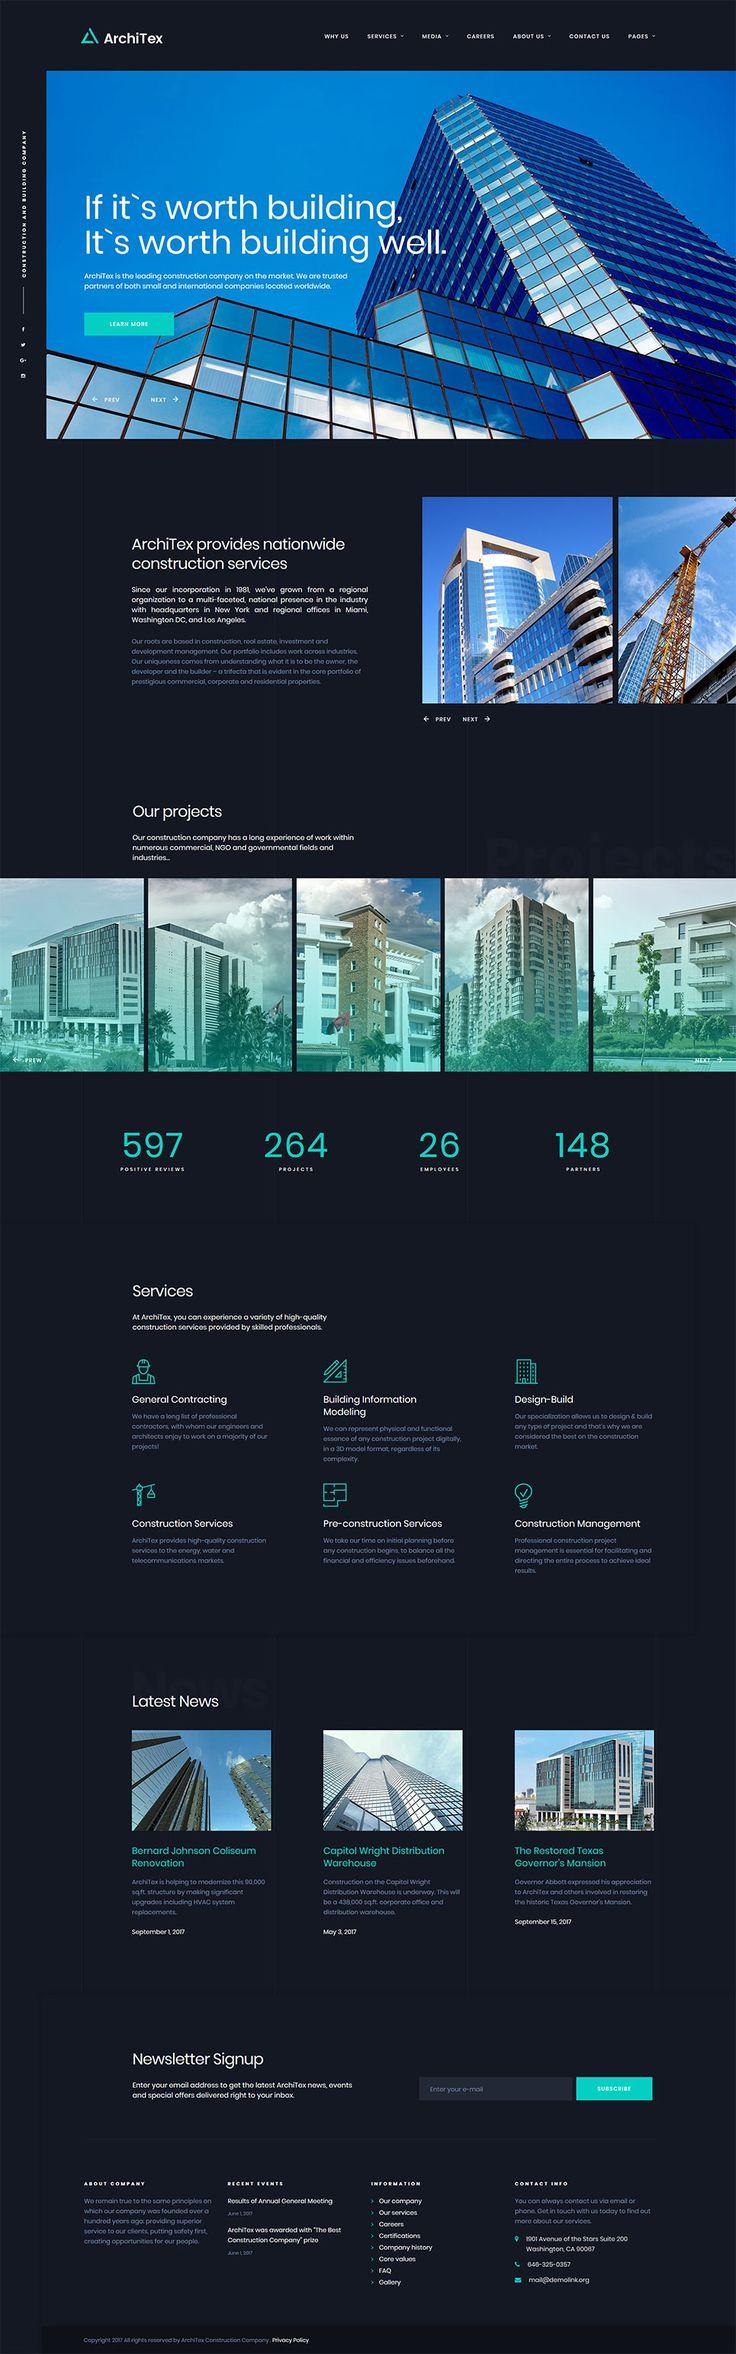 Architex! #architecture #building #construction #responsive #Template Buy Template - http://www.templatecrea.com/website-templates-type/65622.html